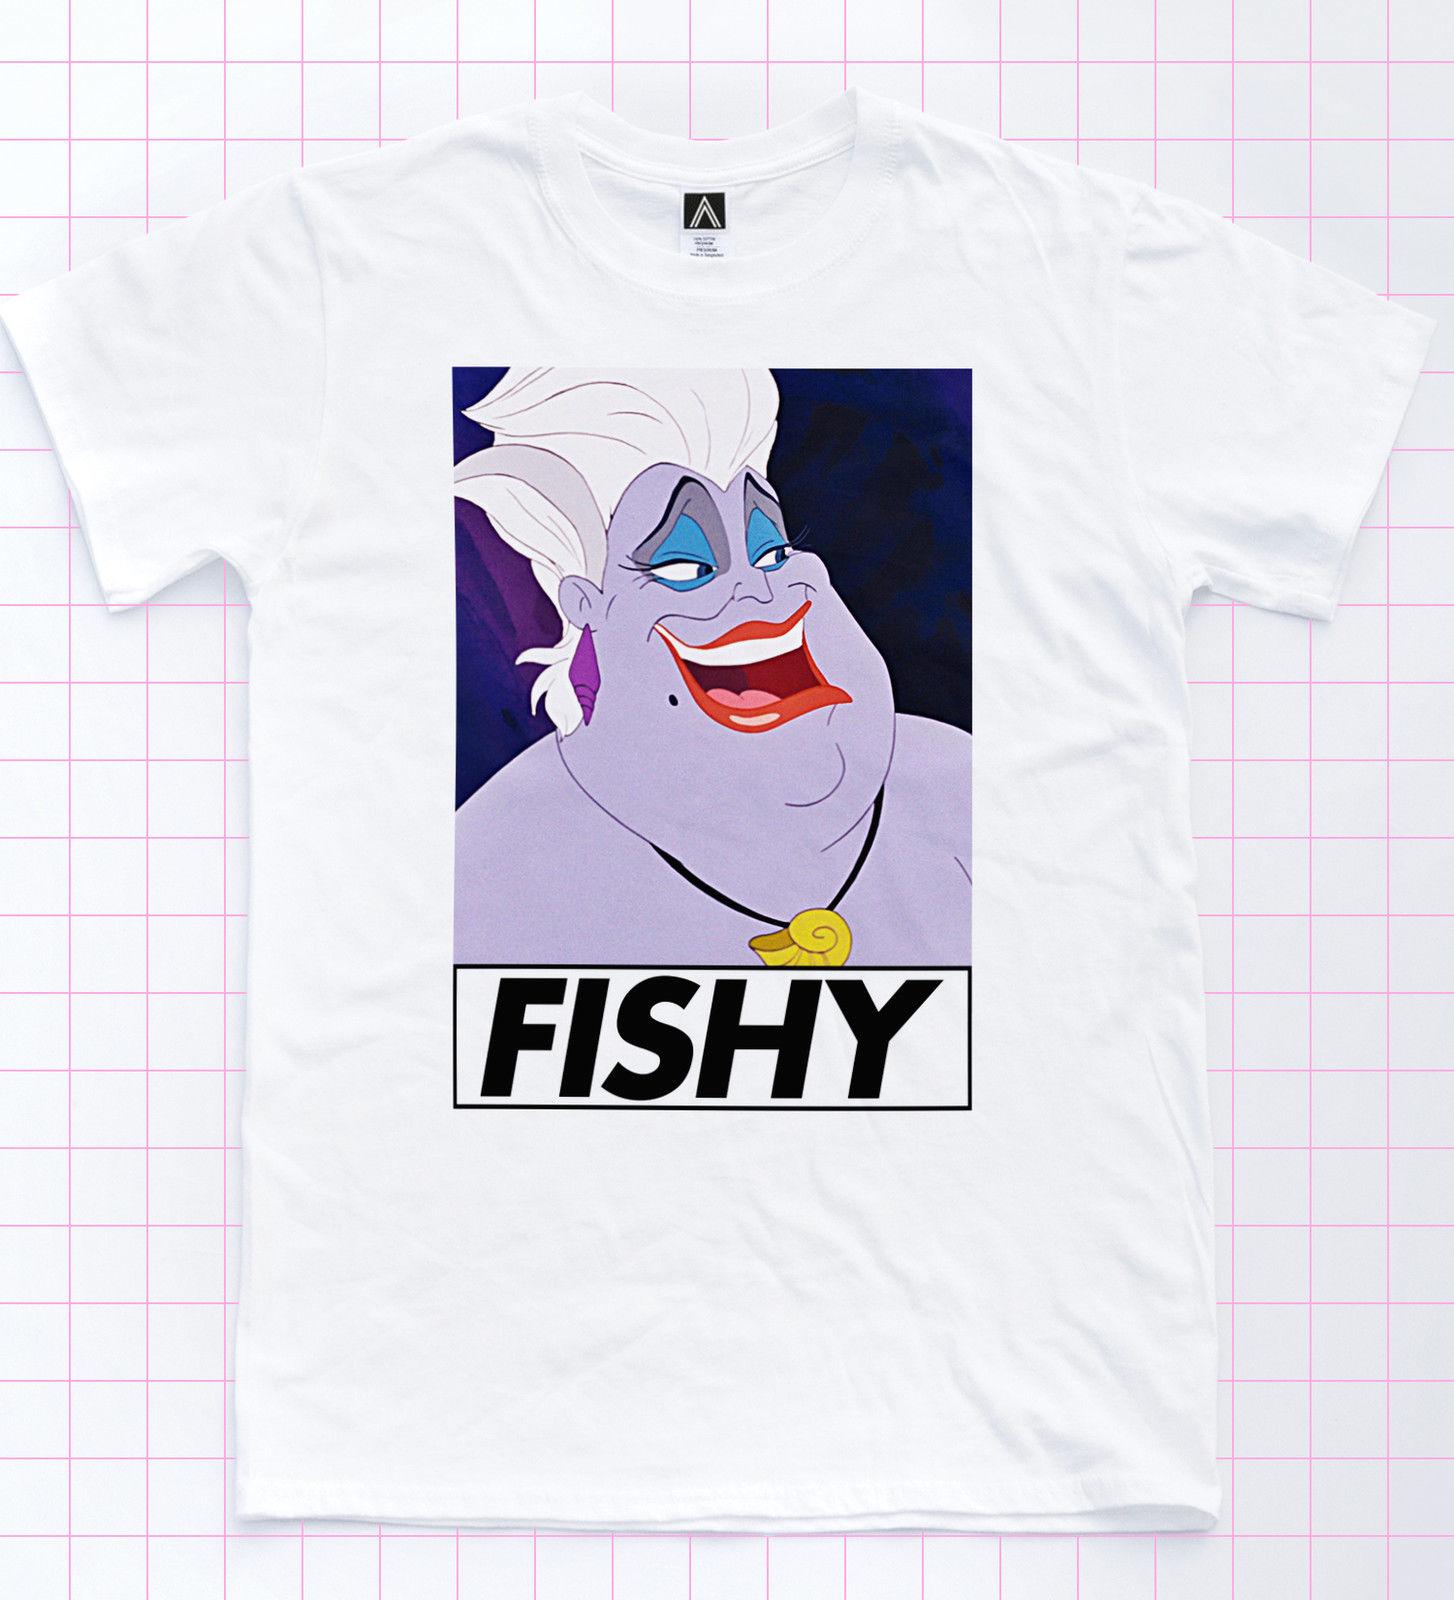 Fishy Ursula Tee Realness servir villano sirena Tee princesa Retro divertido diseño superior estilo nueva moda manga corta divertida